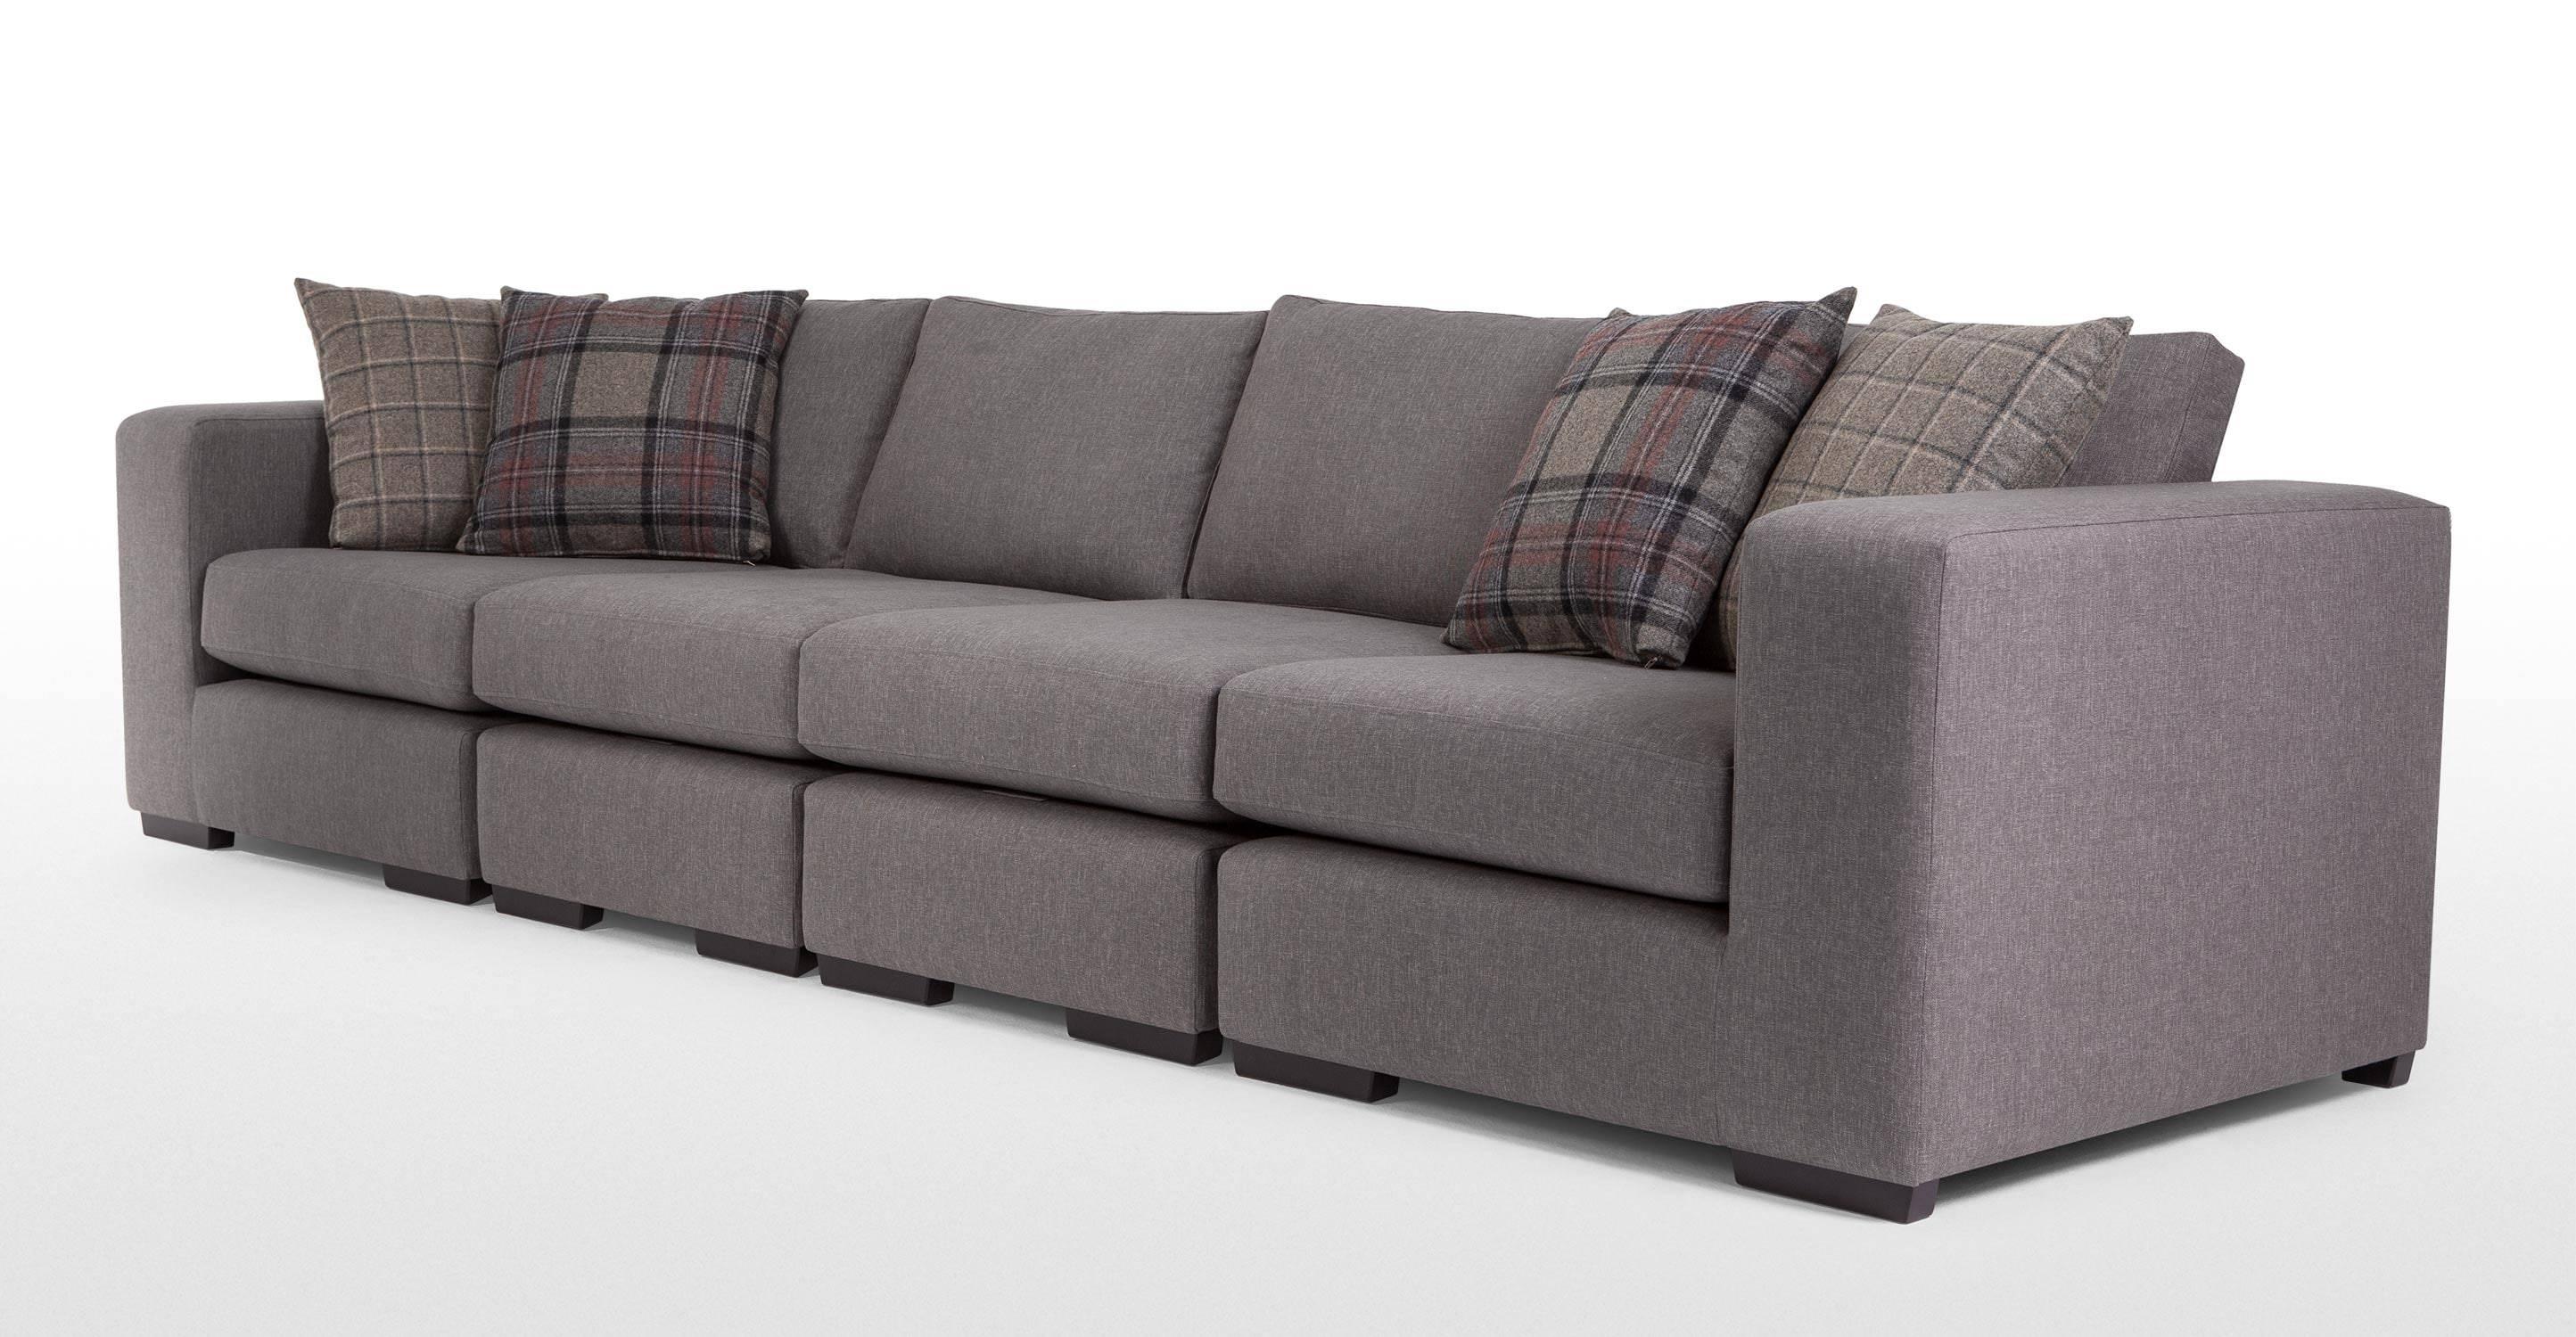 Abingdon Modular Corner Sofa Group In Misty Grey | Made for Modular Corner Sofas (Image 7 of 30)